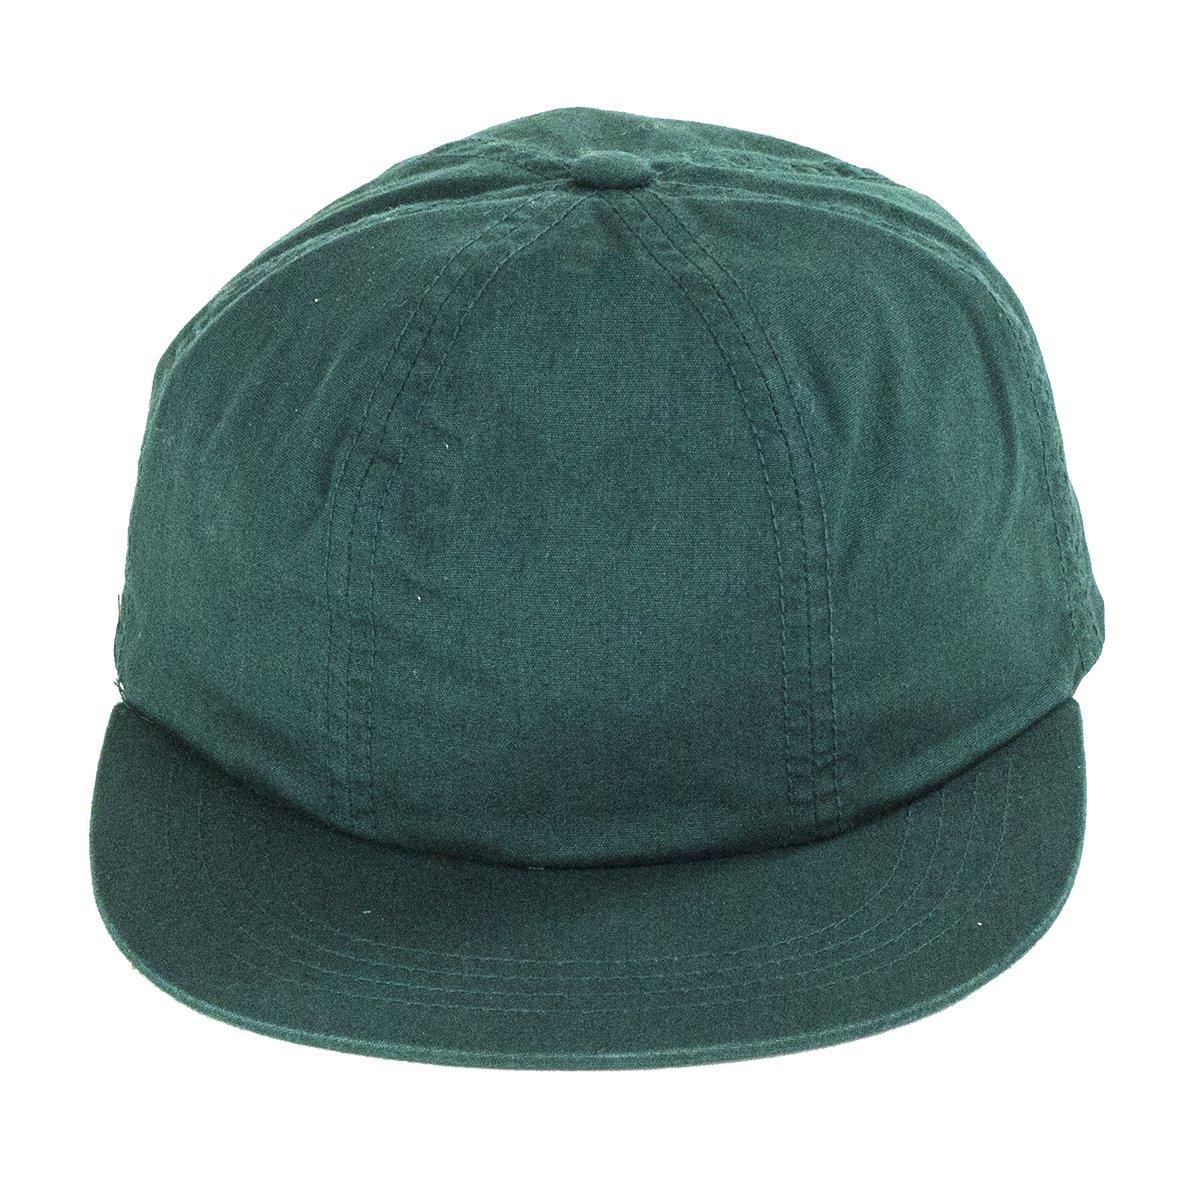 502b5867dce57 Brixton Hats Lakewood Adjustable Baseball Cap - Forest Green  Amazon.co.uk   Clothing